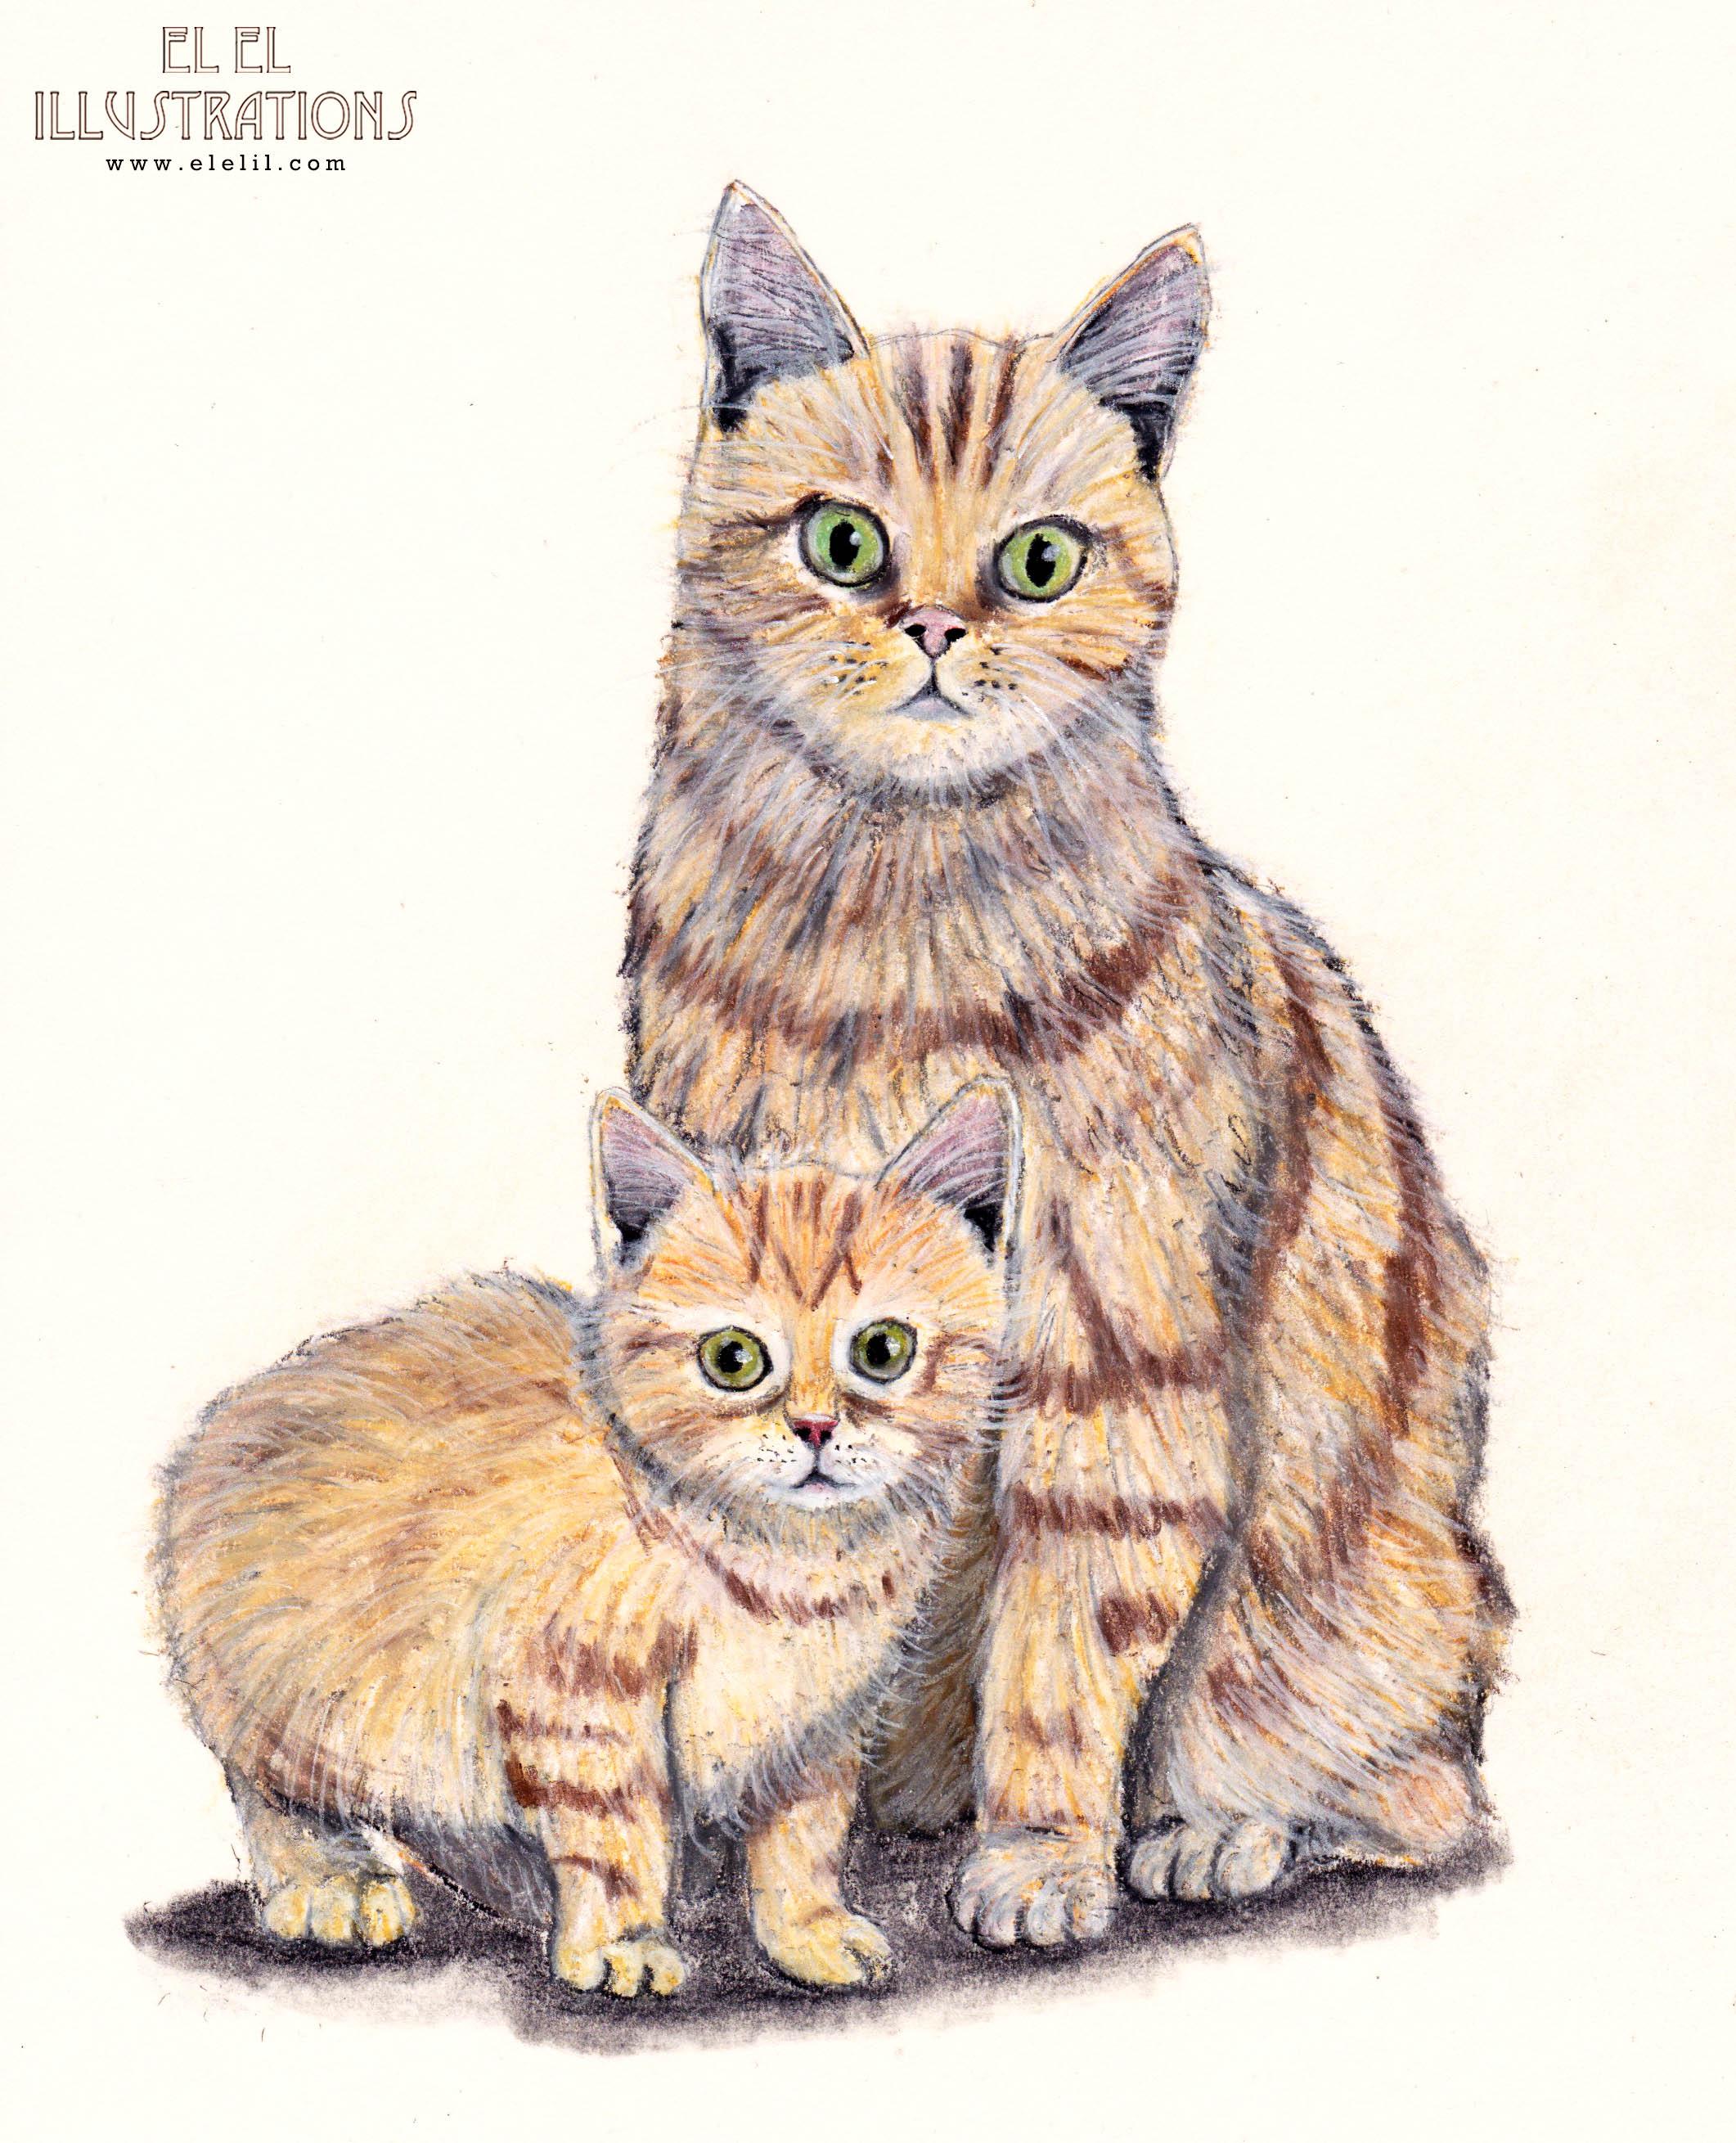 fathersday_cat_wm.jpg